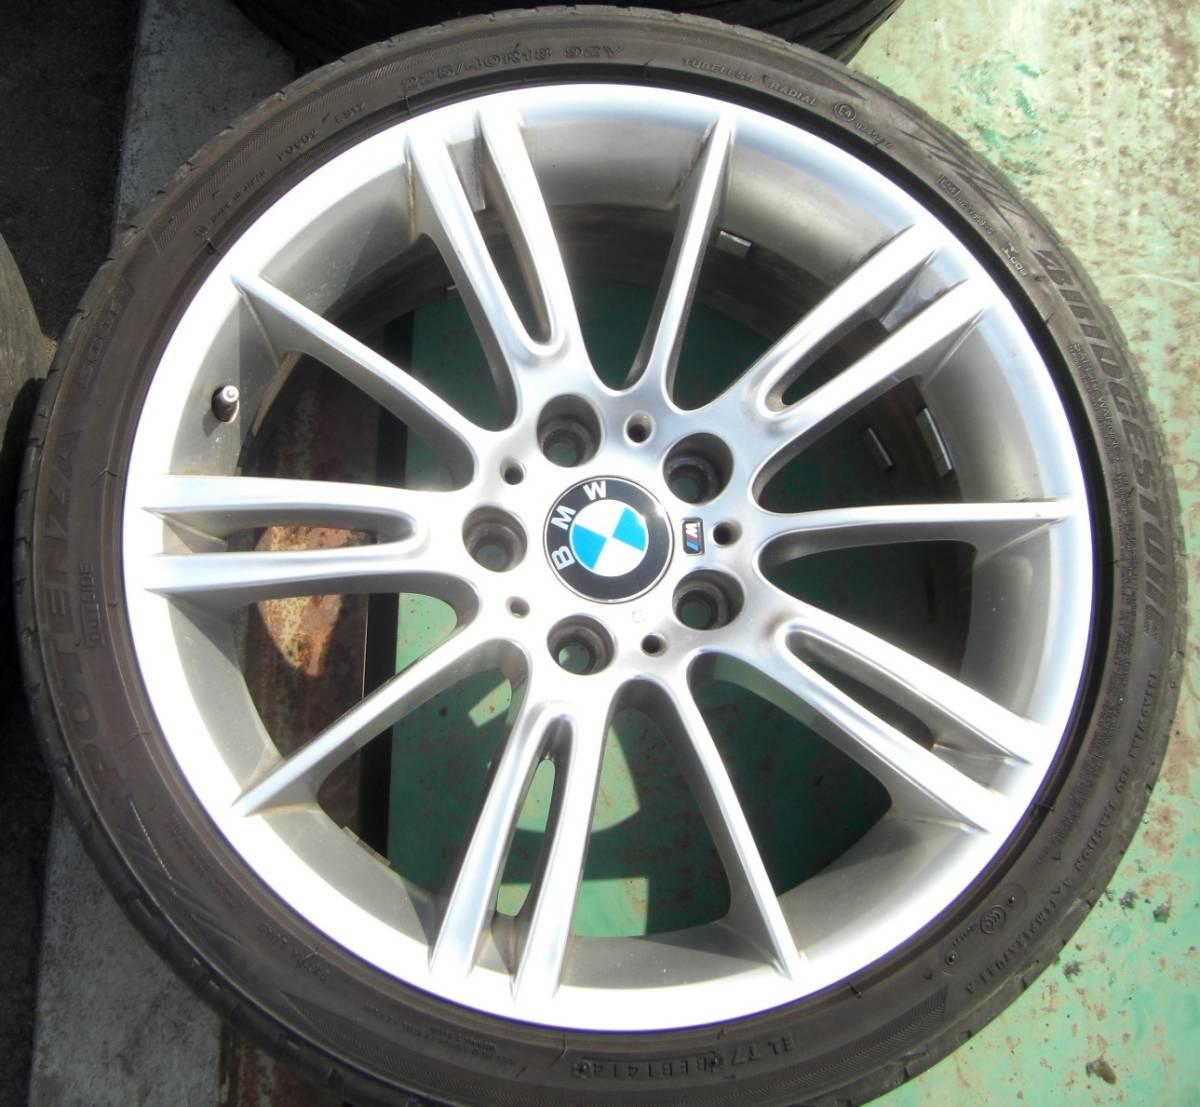 BMW E90 E92 3シリーズ Mスポーツ 純正 18in 8J+32 8.5J+37 PCD120 ブリヂストン ポテンザ 225/40R18 255/35R18_画像3